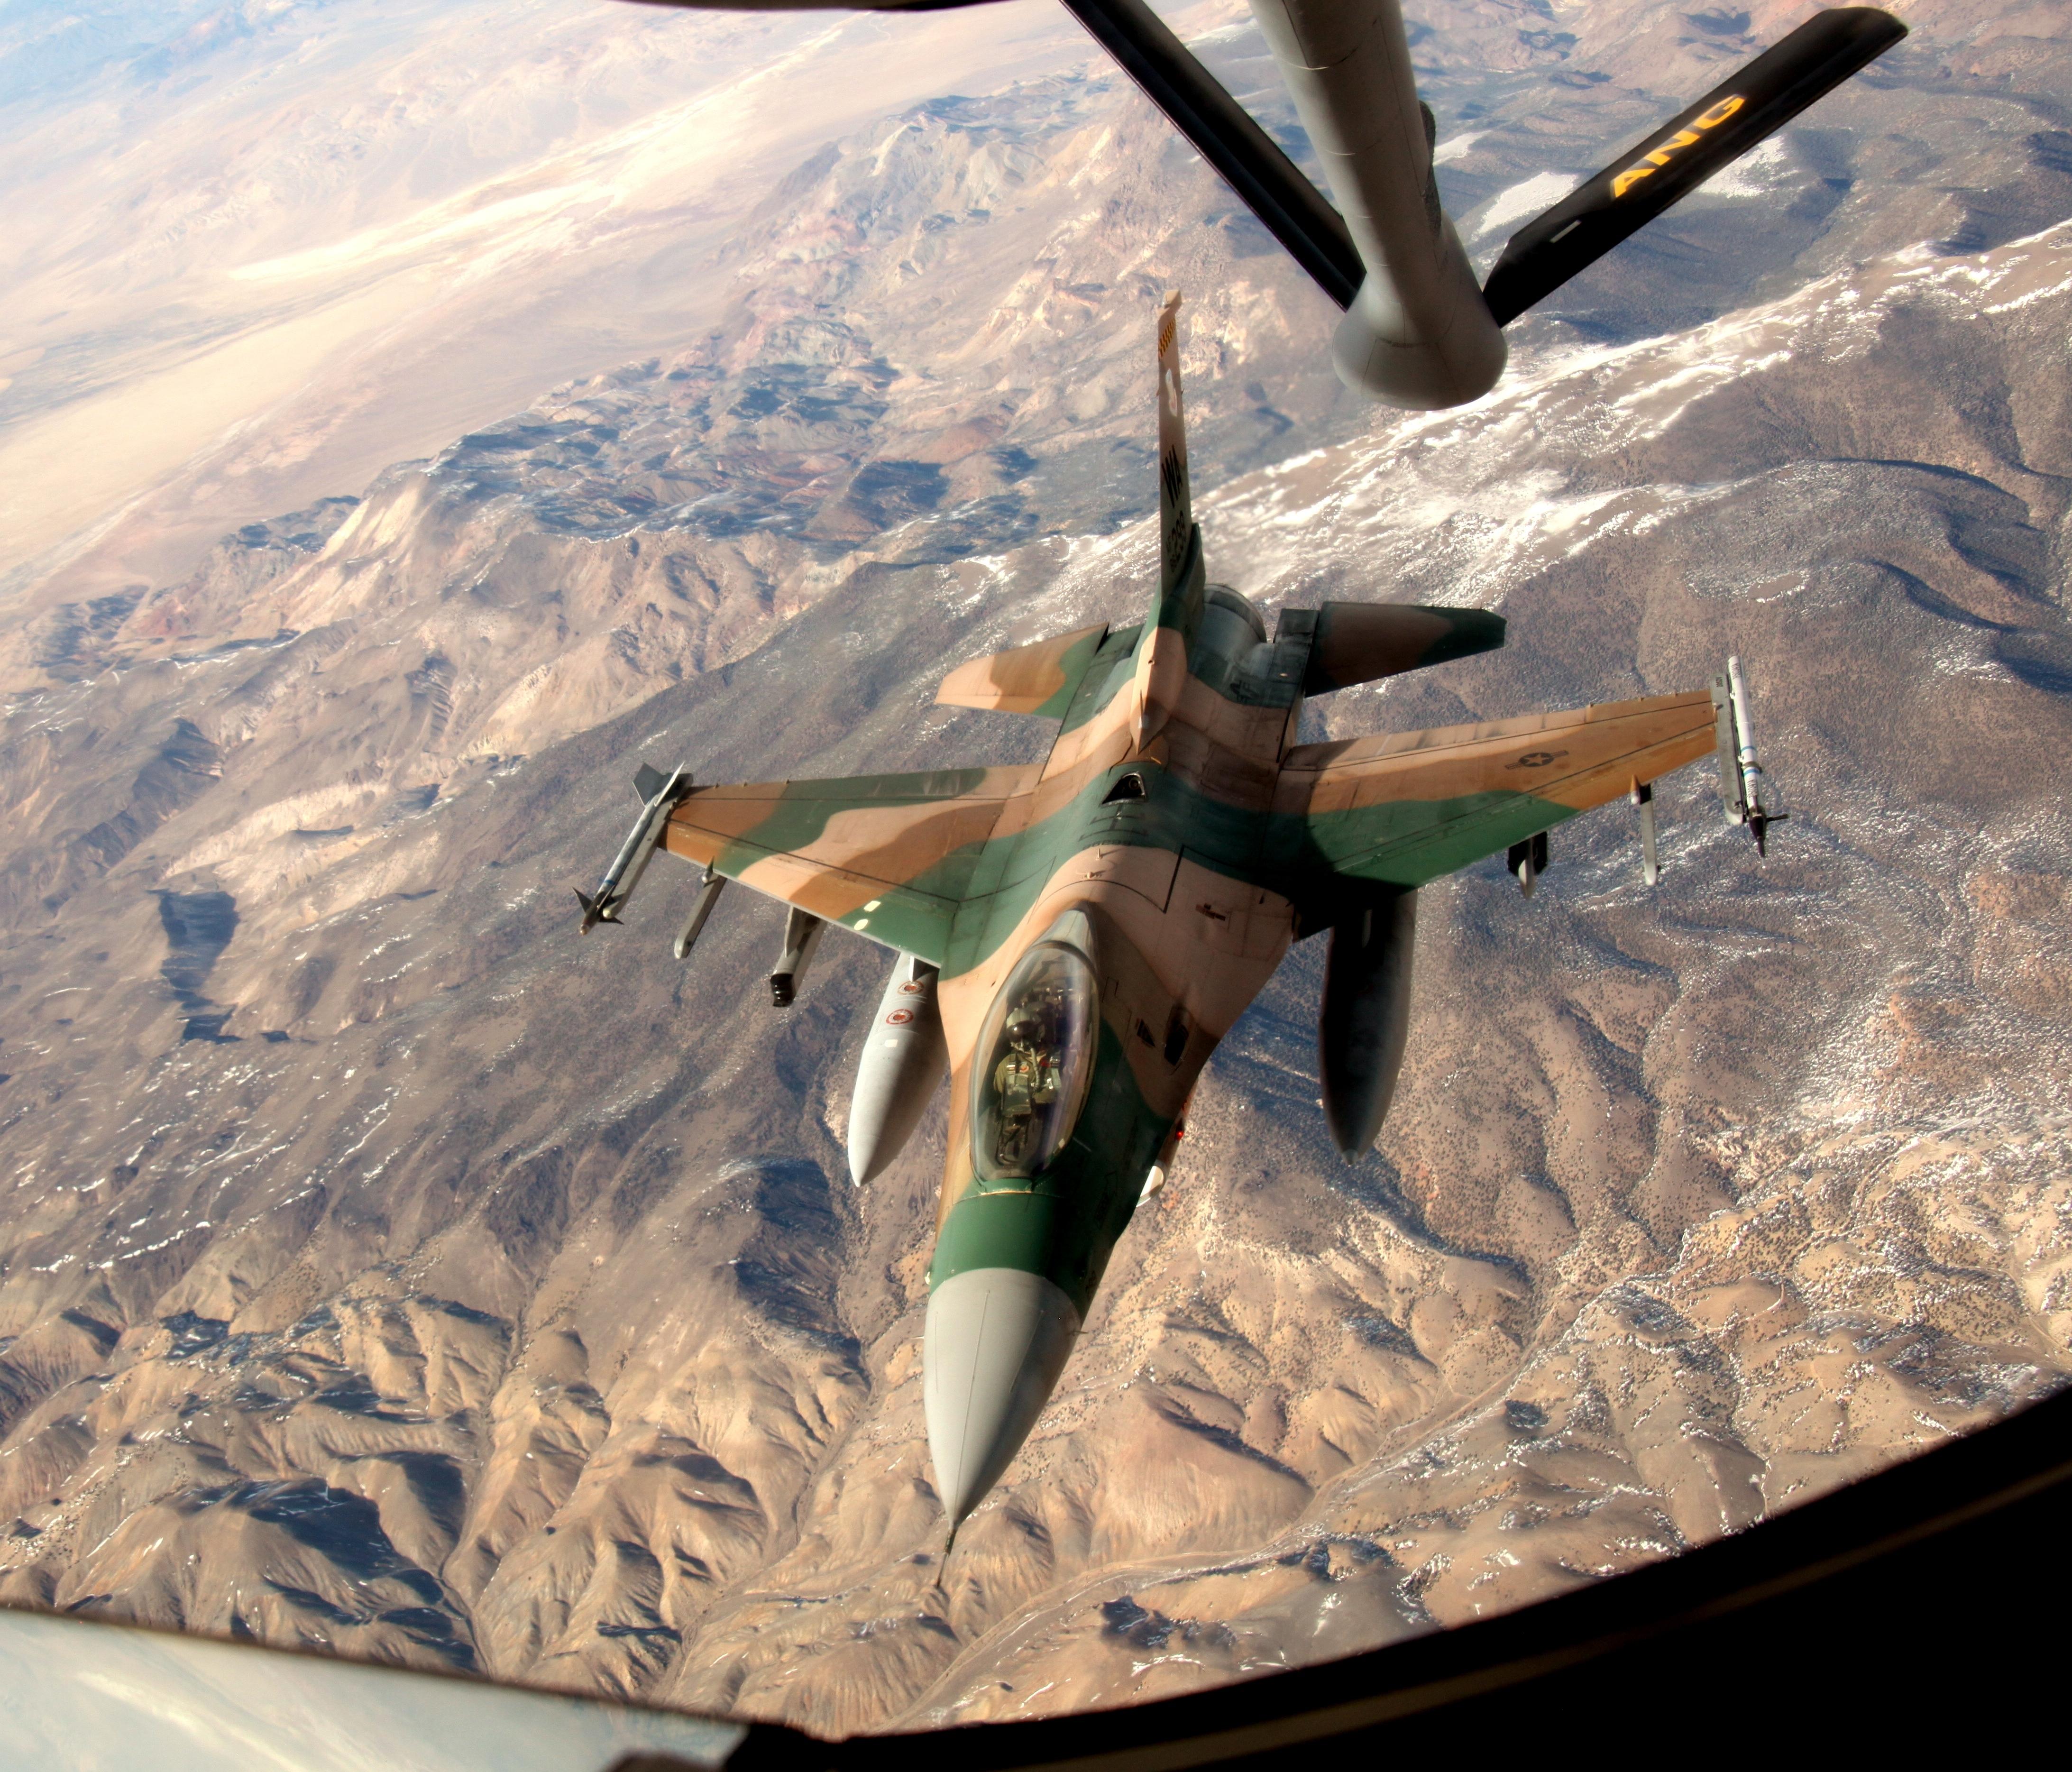 64th AGRS F-16C